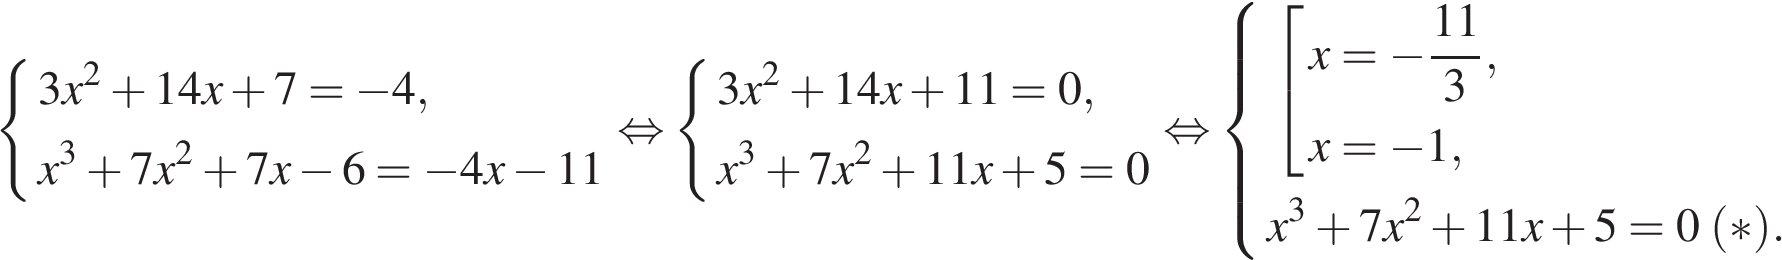 http://reshuege.ru/formula/73/73c7fce77e4f679f8c18d9328201d397p.png